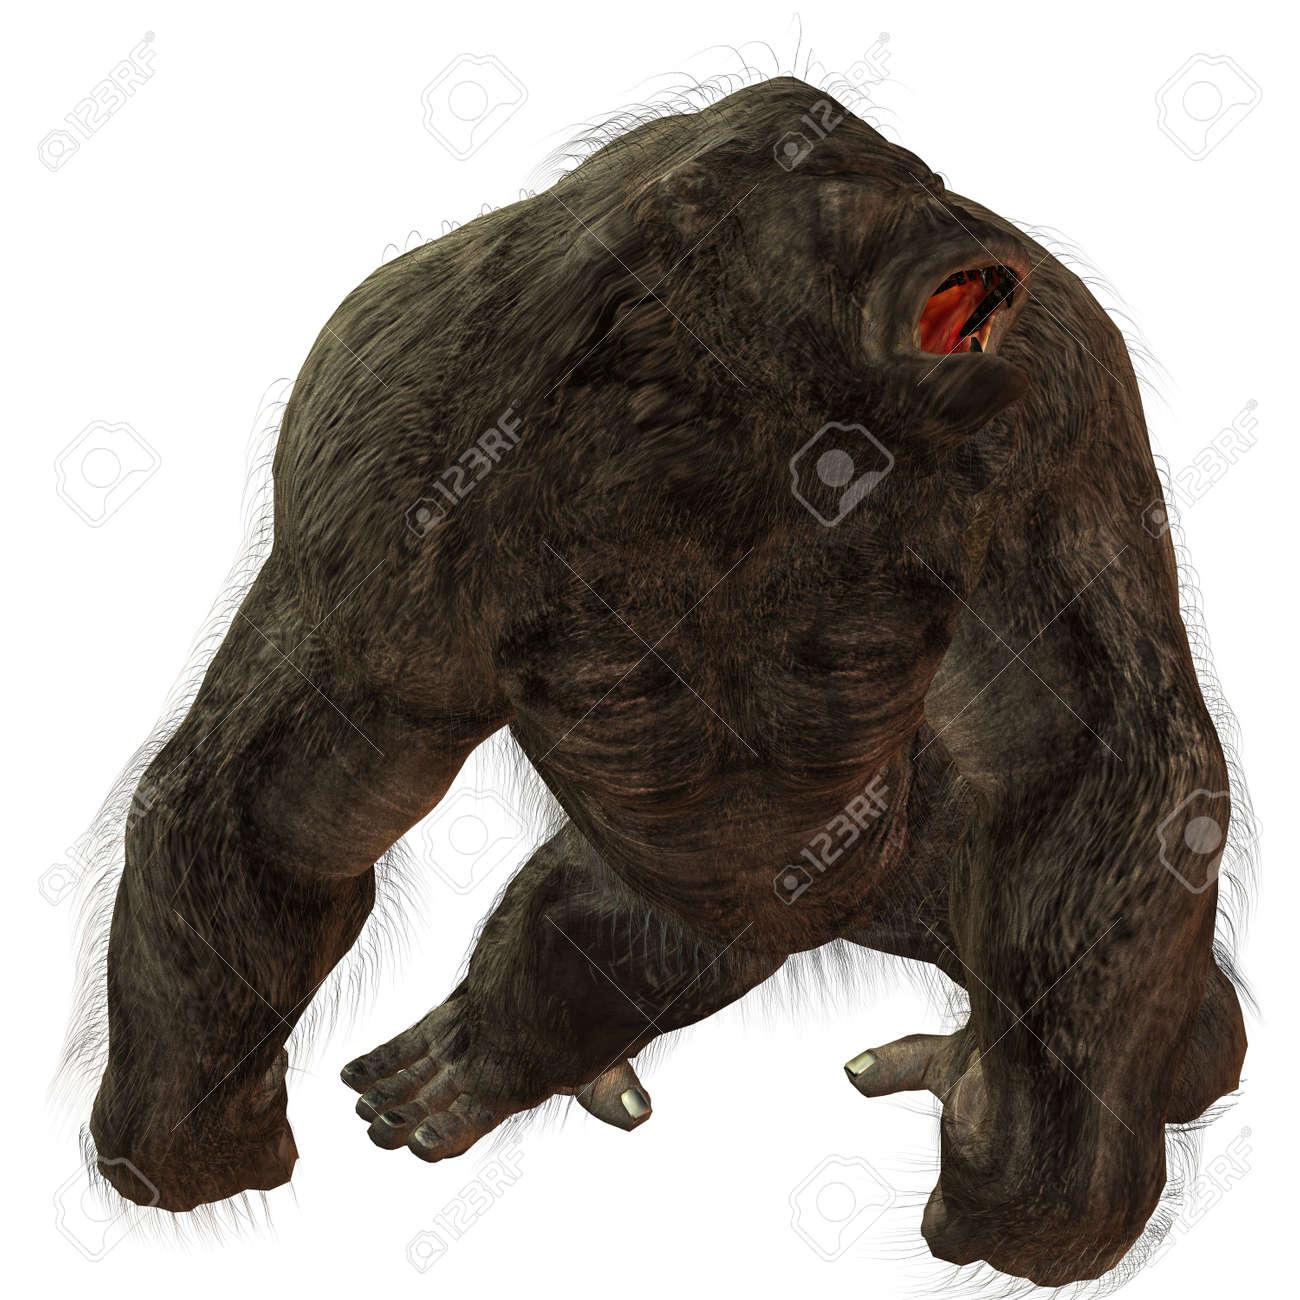 3D Render of an Silverback Gorilla Stock Photo - 3683785